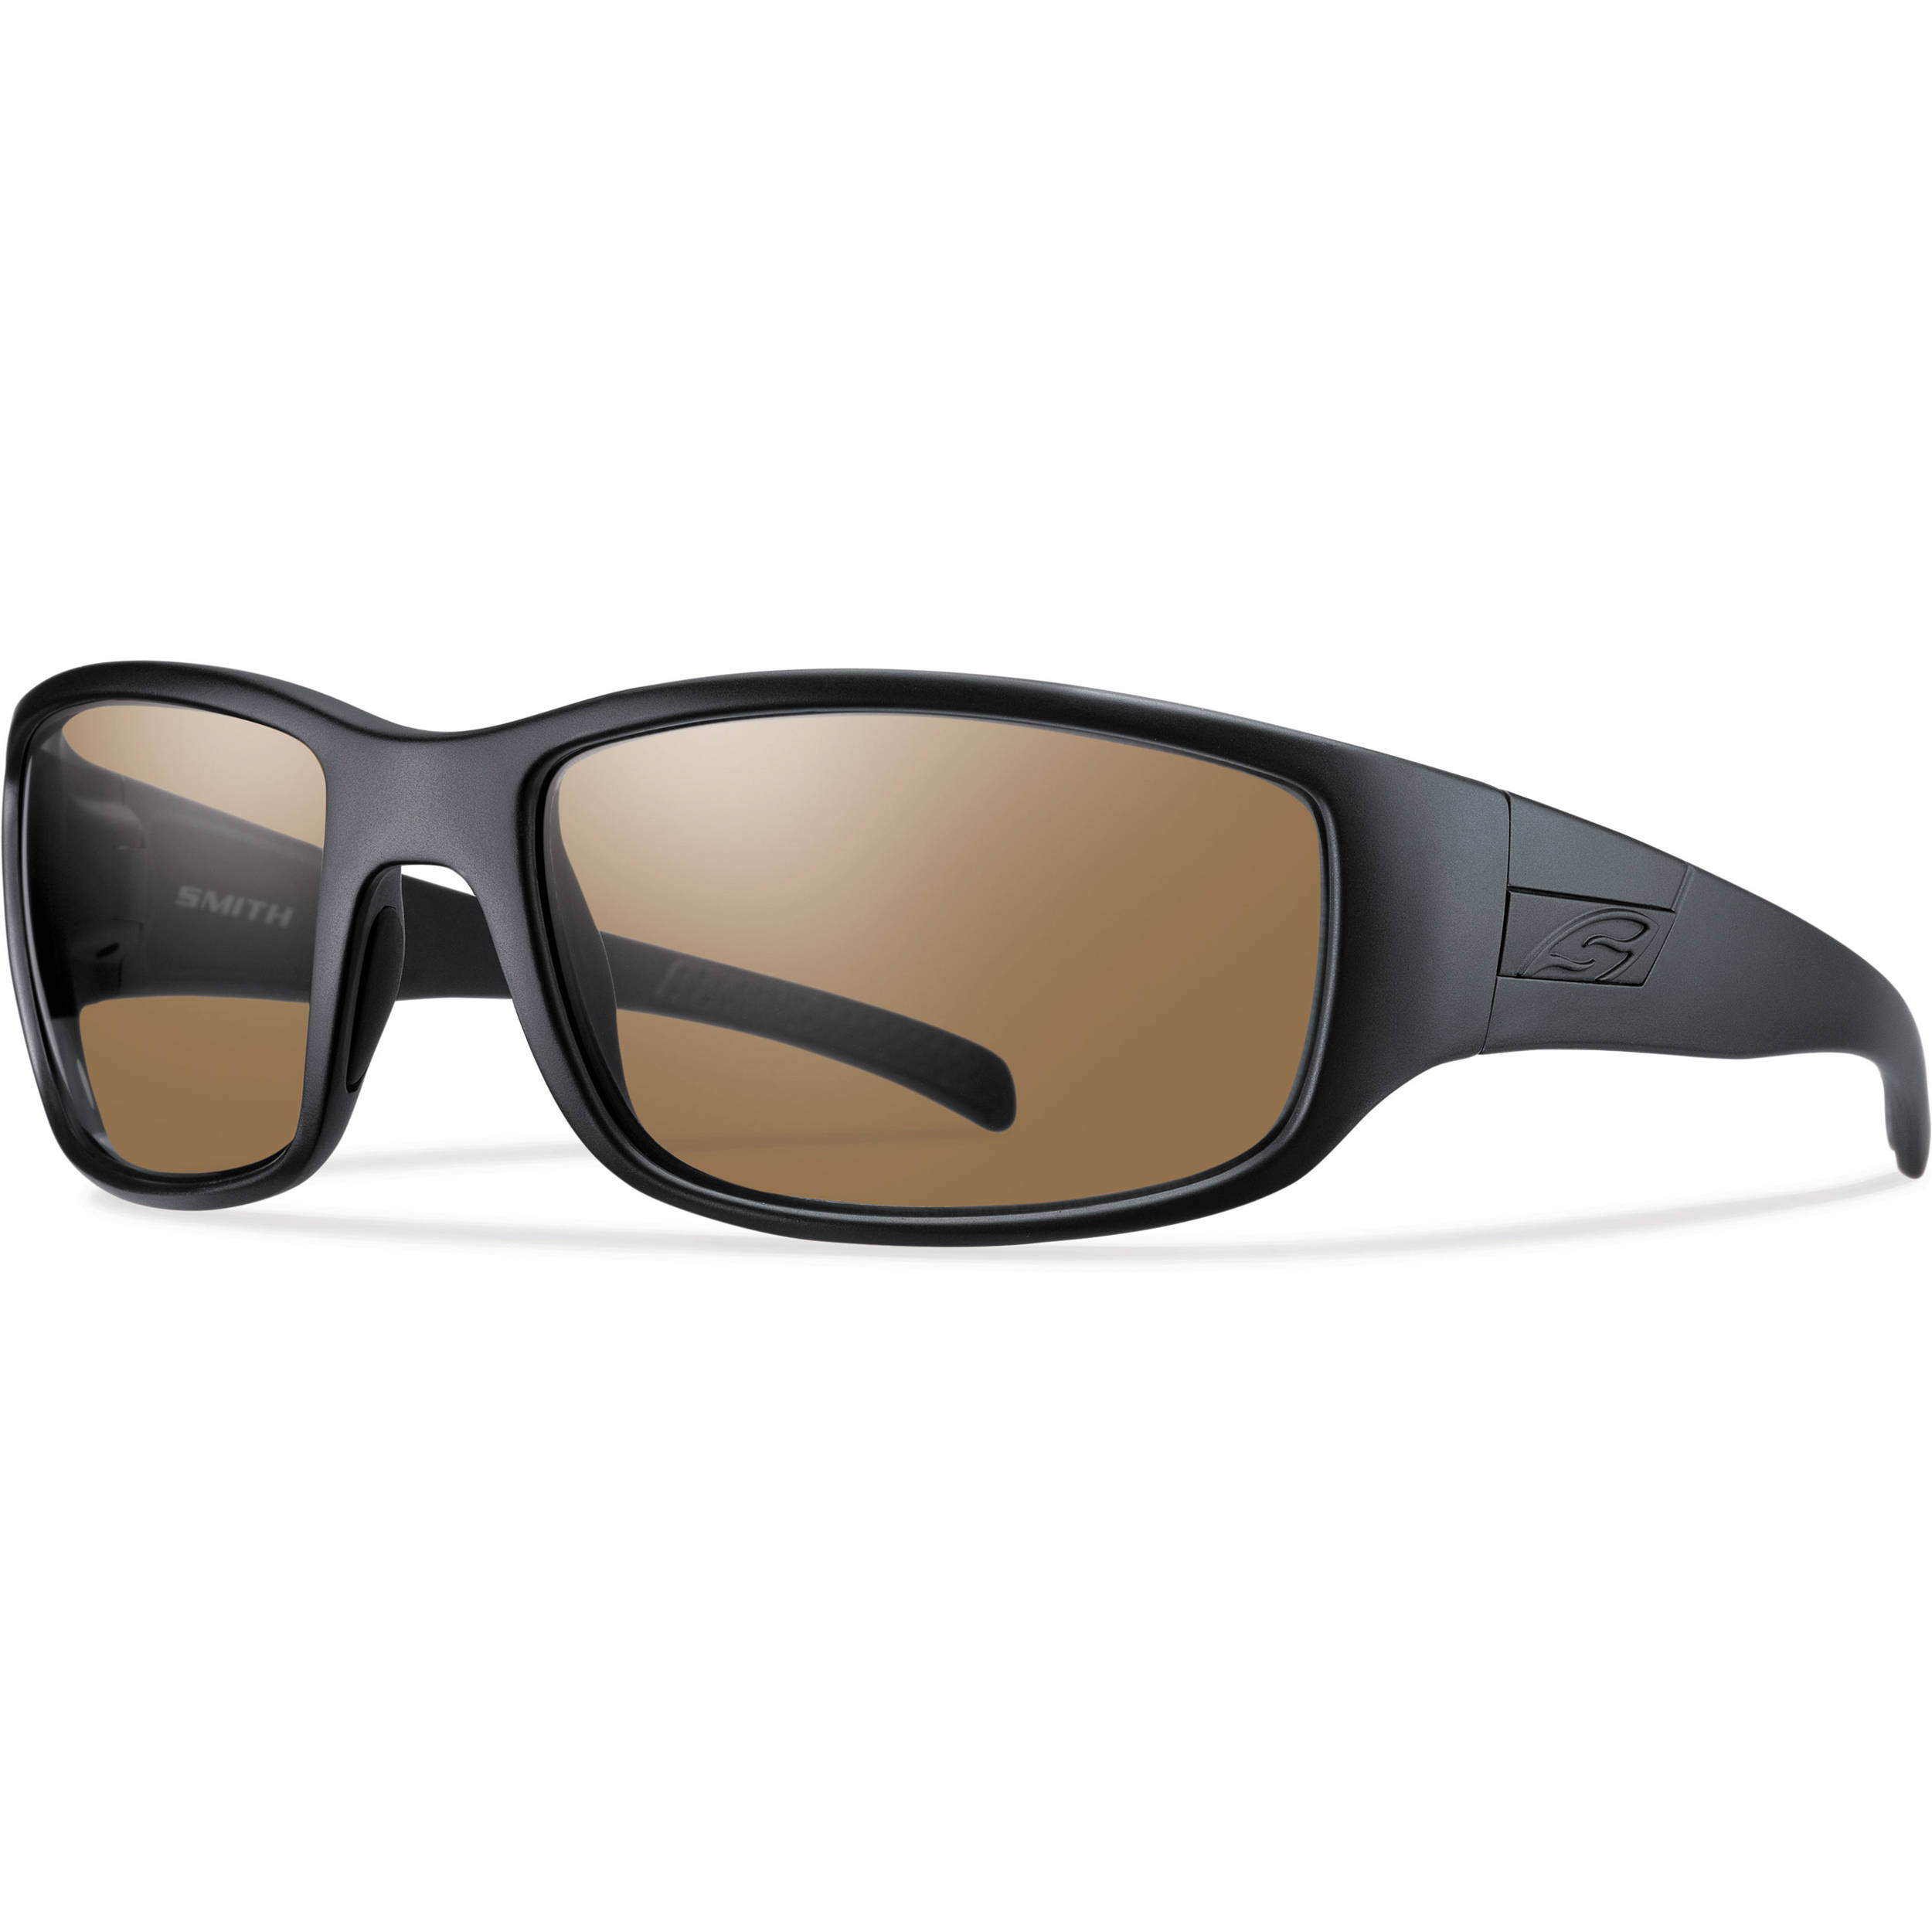 586737ad29 Smith Optics Prospect Polarized Sunglasses